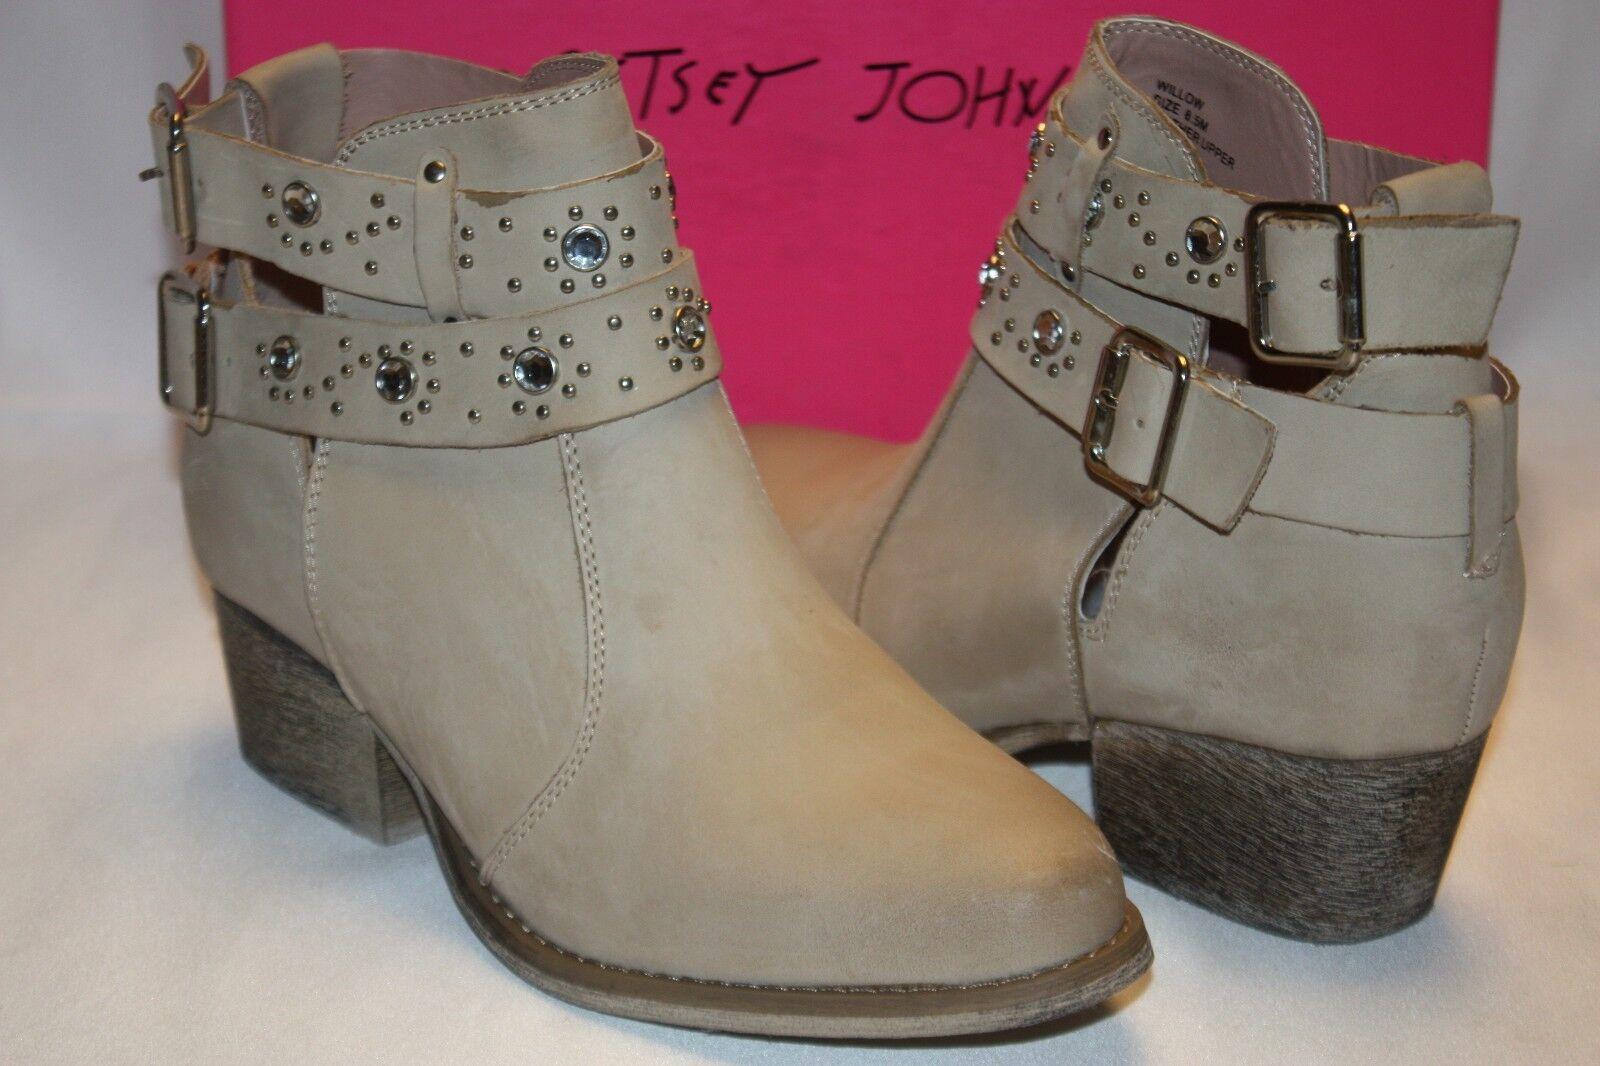 NEW  NIB  BETSEY JOHNSON Bone Leather WILLOW Jewel Stud Ankle Boot 6 8.5  195